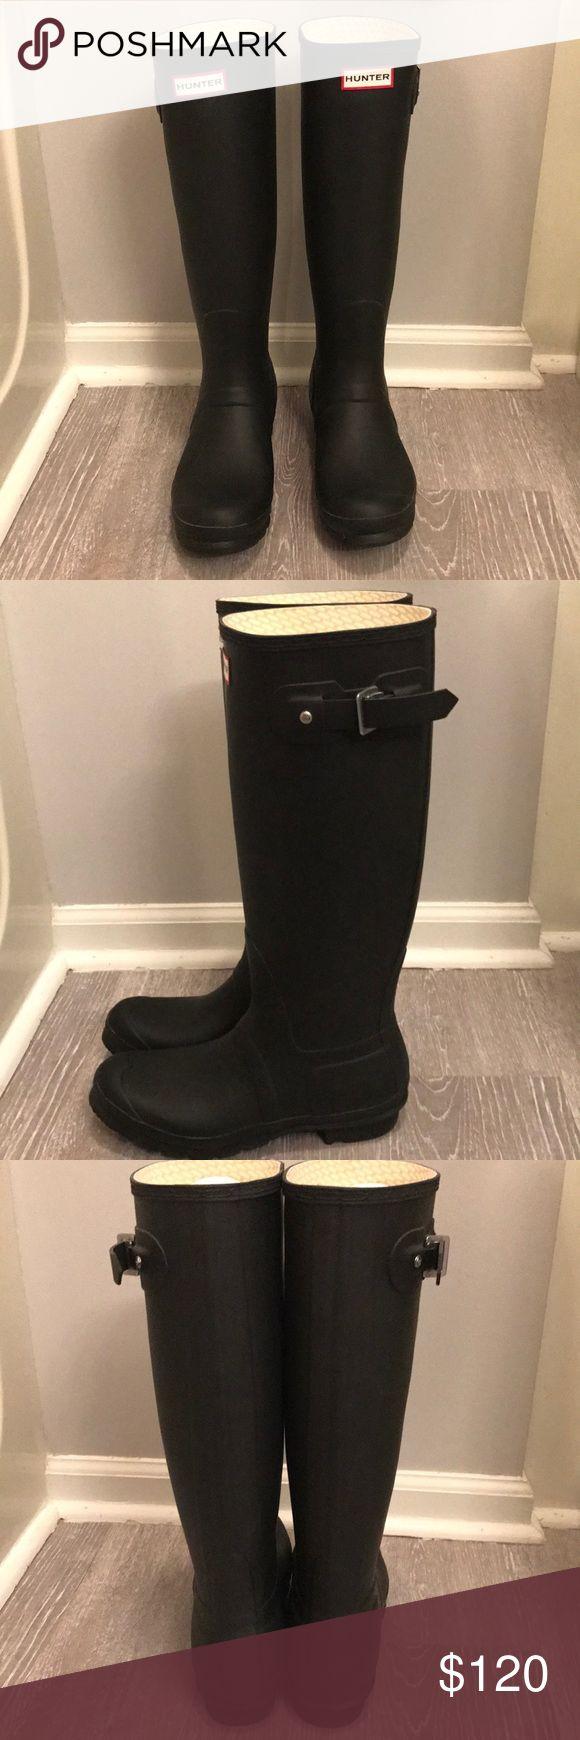 NWOT Black Hunter Rain Boots women's 9/men's 8 black hunter original tall black matte rain boots!!! never worn!!! Hunter Boots Shoes Winter & Rain Boots